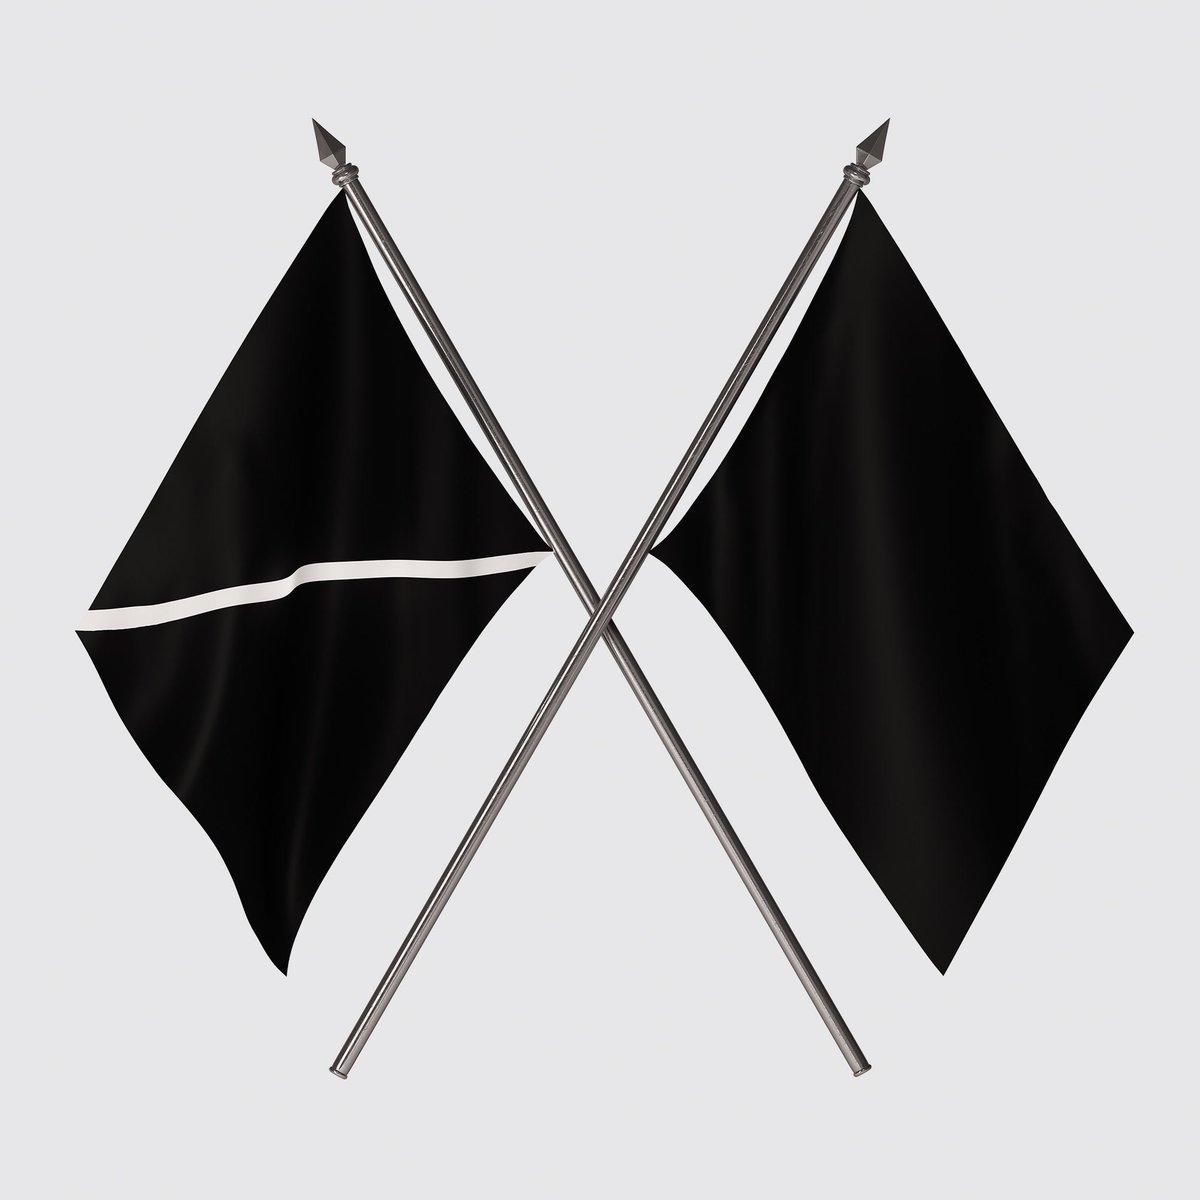 Imagini pentru obsession the 6th album